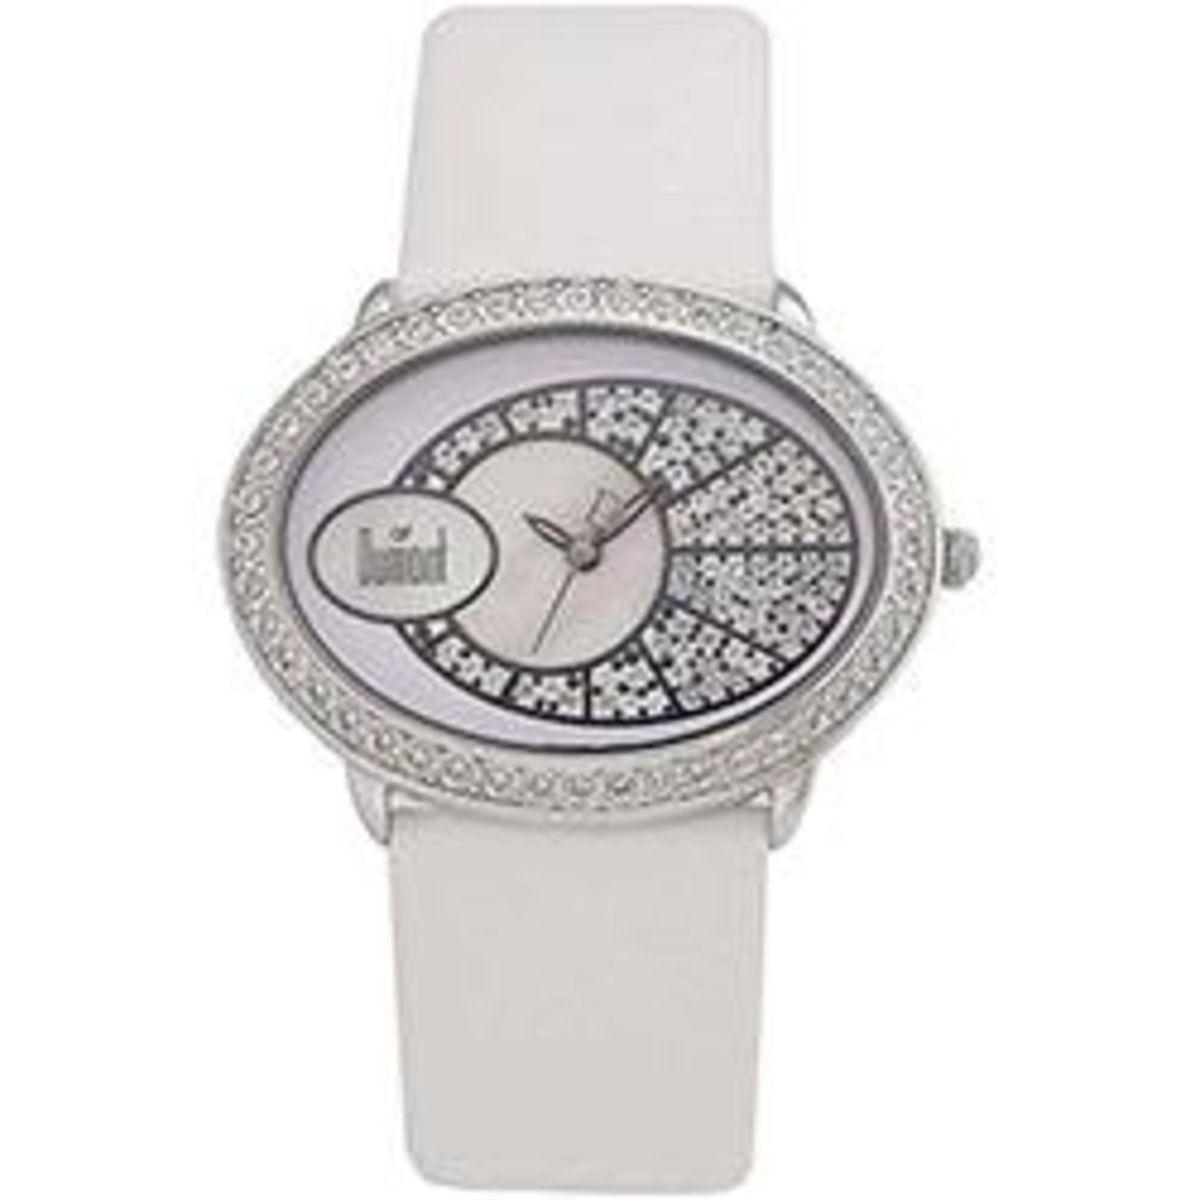 6df380206b4 relógio dumont pulso feminino pulseira branca com cristais - relógios dumond